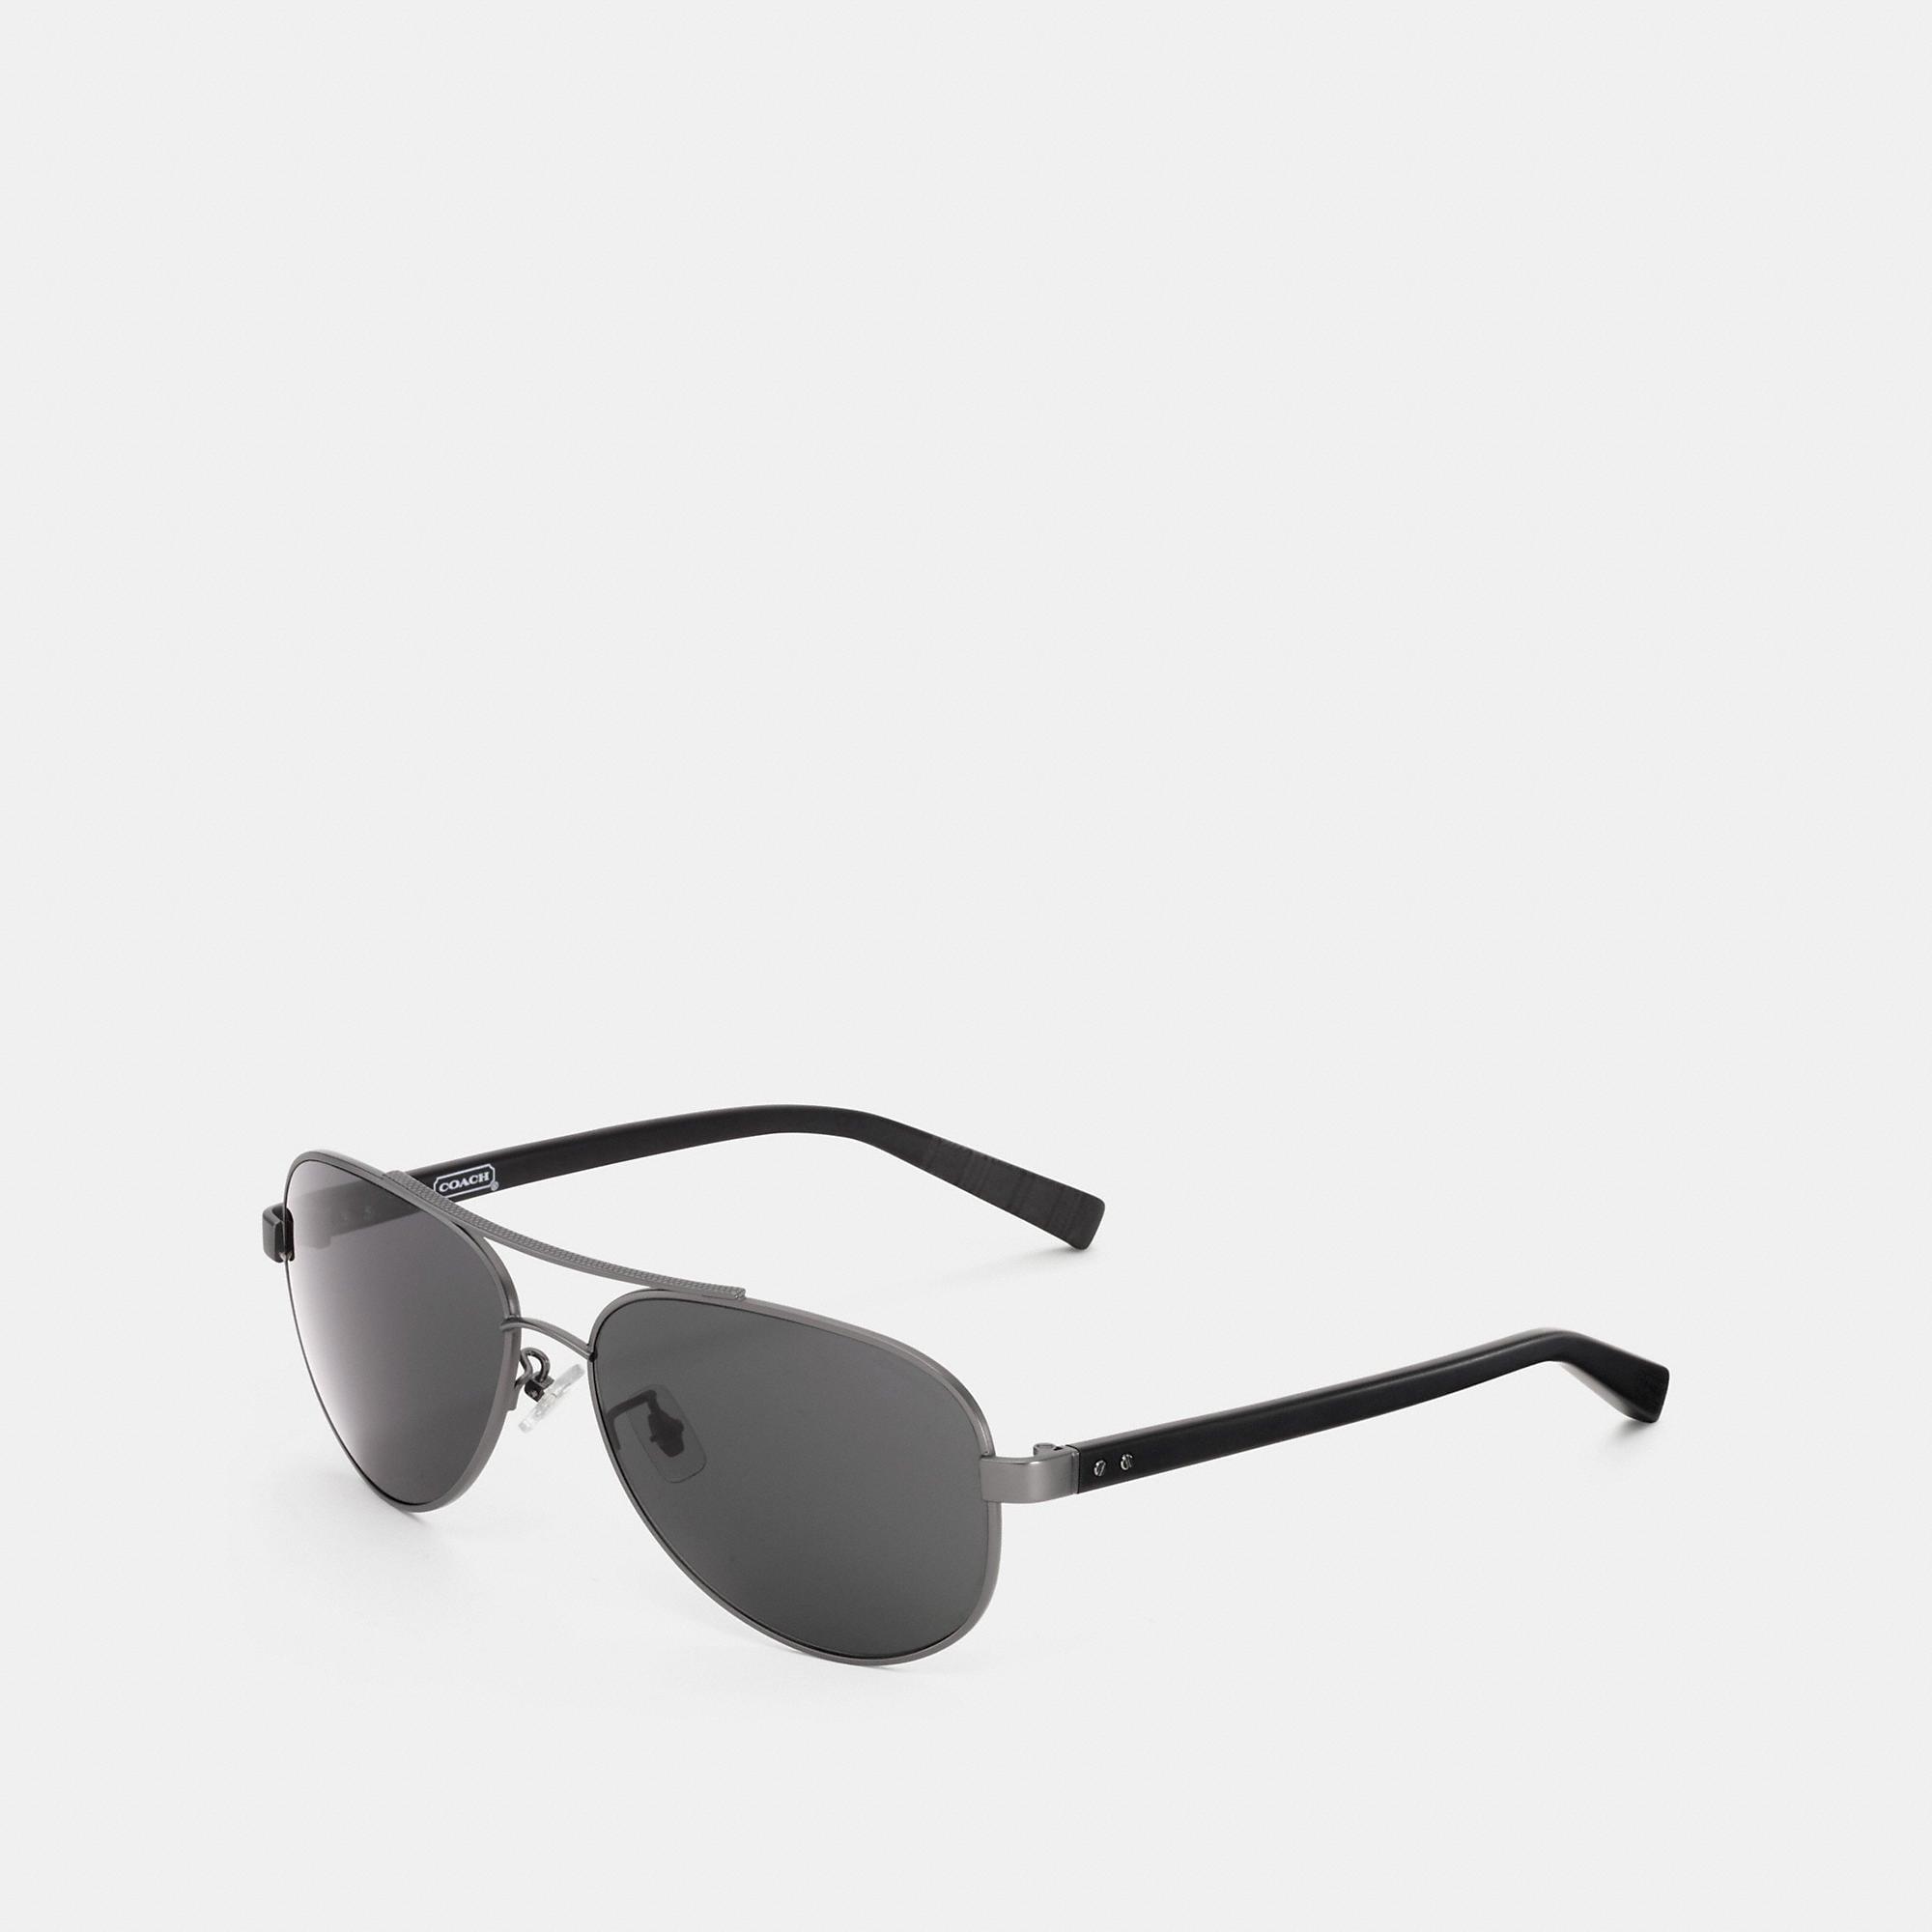 Coach Thompson Sunglasses